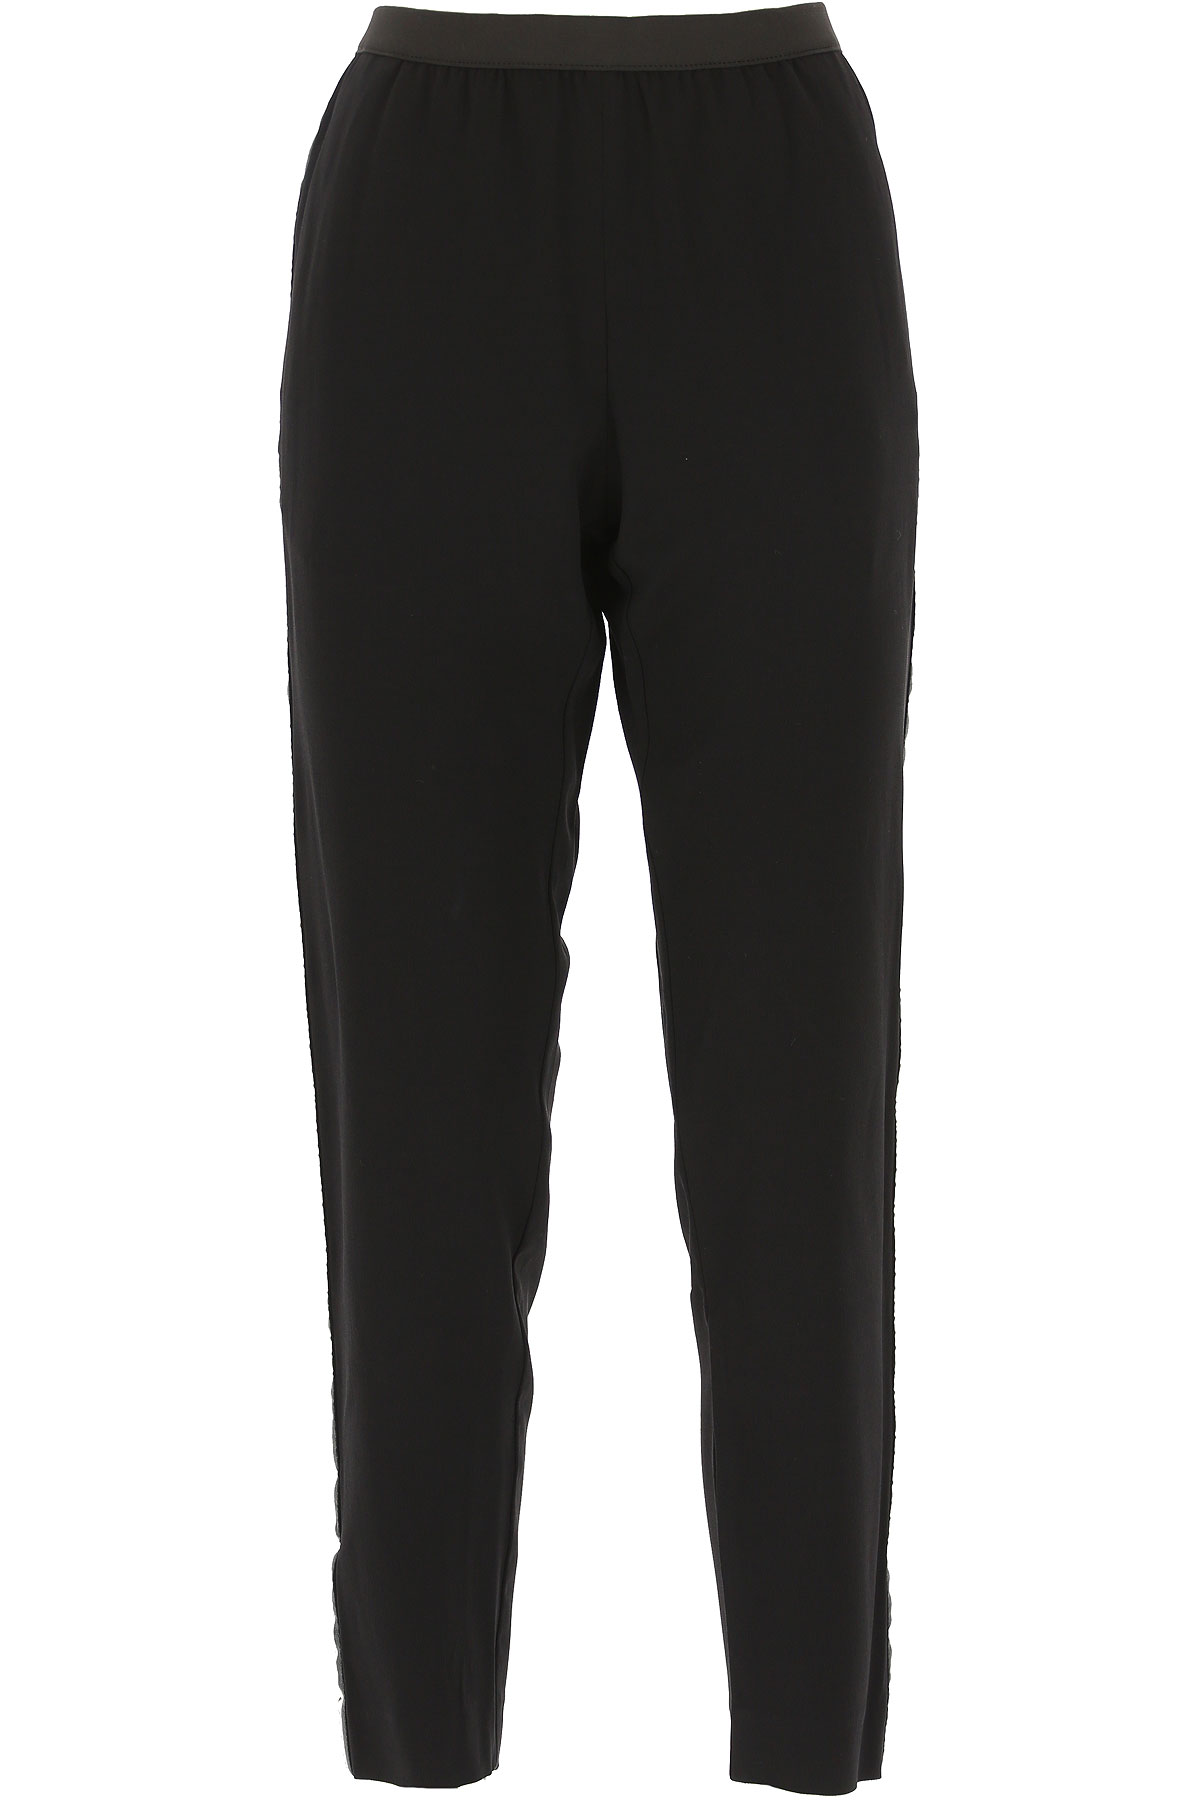 Zadig & Voltaire Pants for Women On Sale, Black, Viscose, 2019, 26 28 30